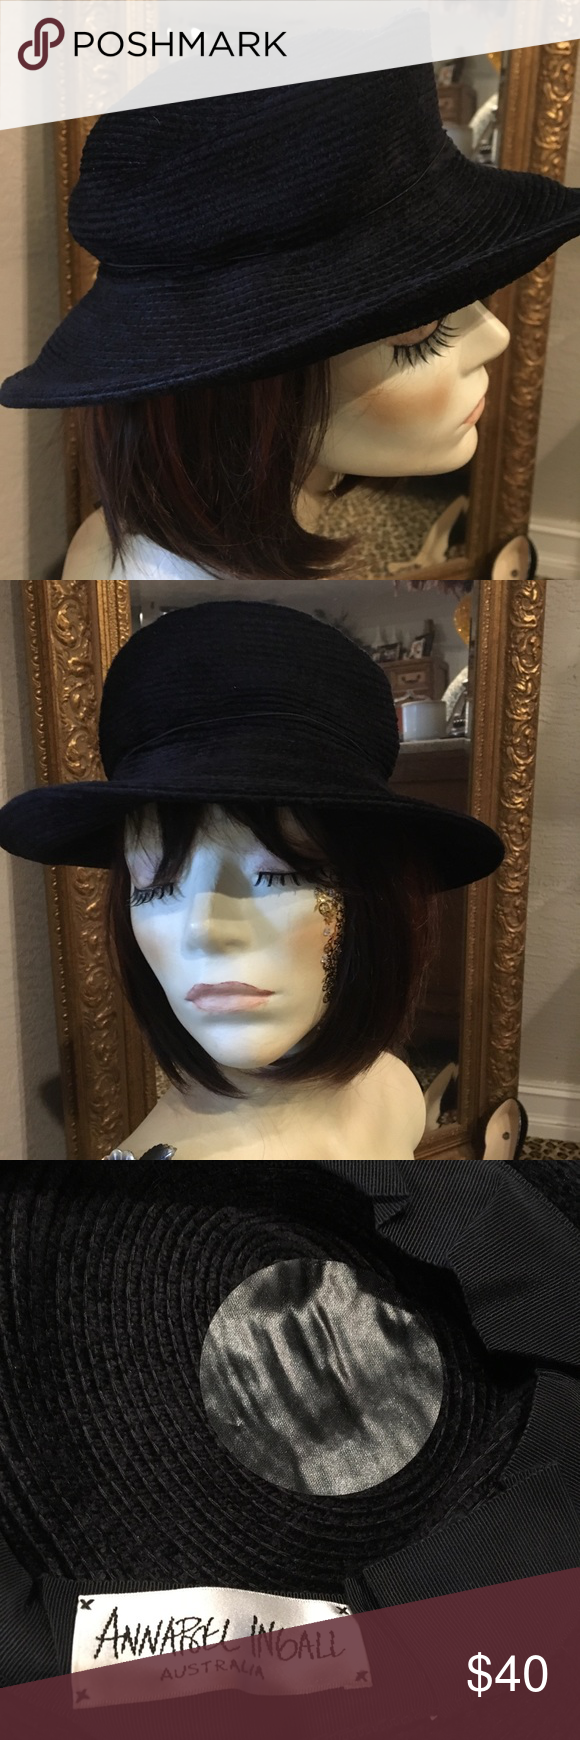 Annabelle Ingall Black Hat Hats Black Hat Women Shopping